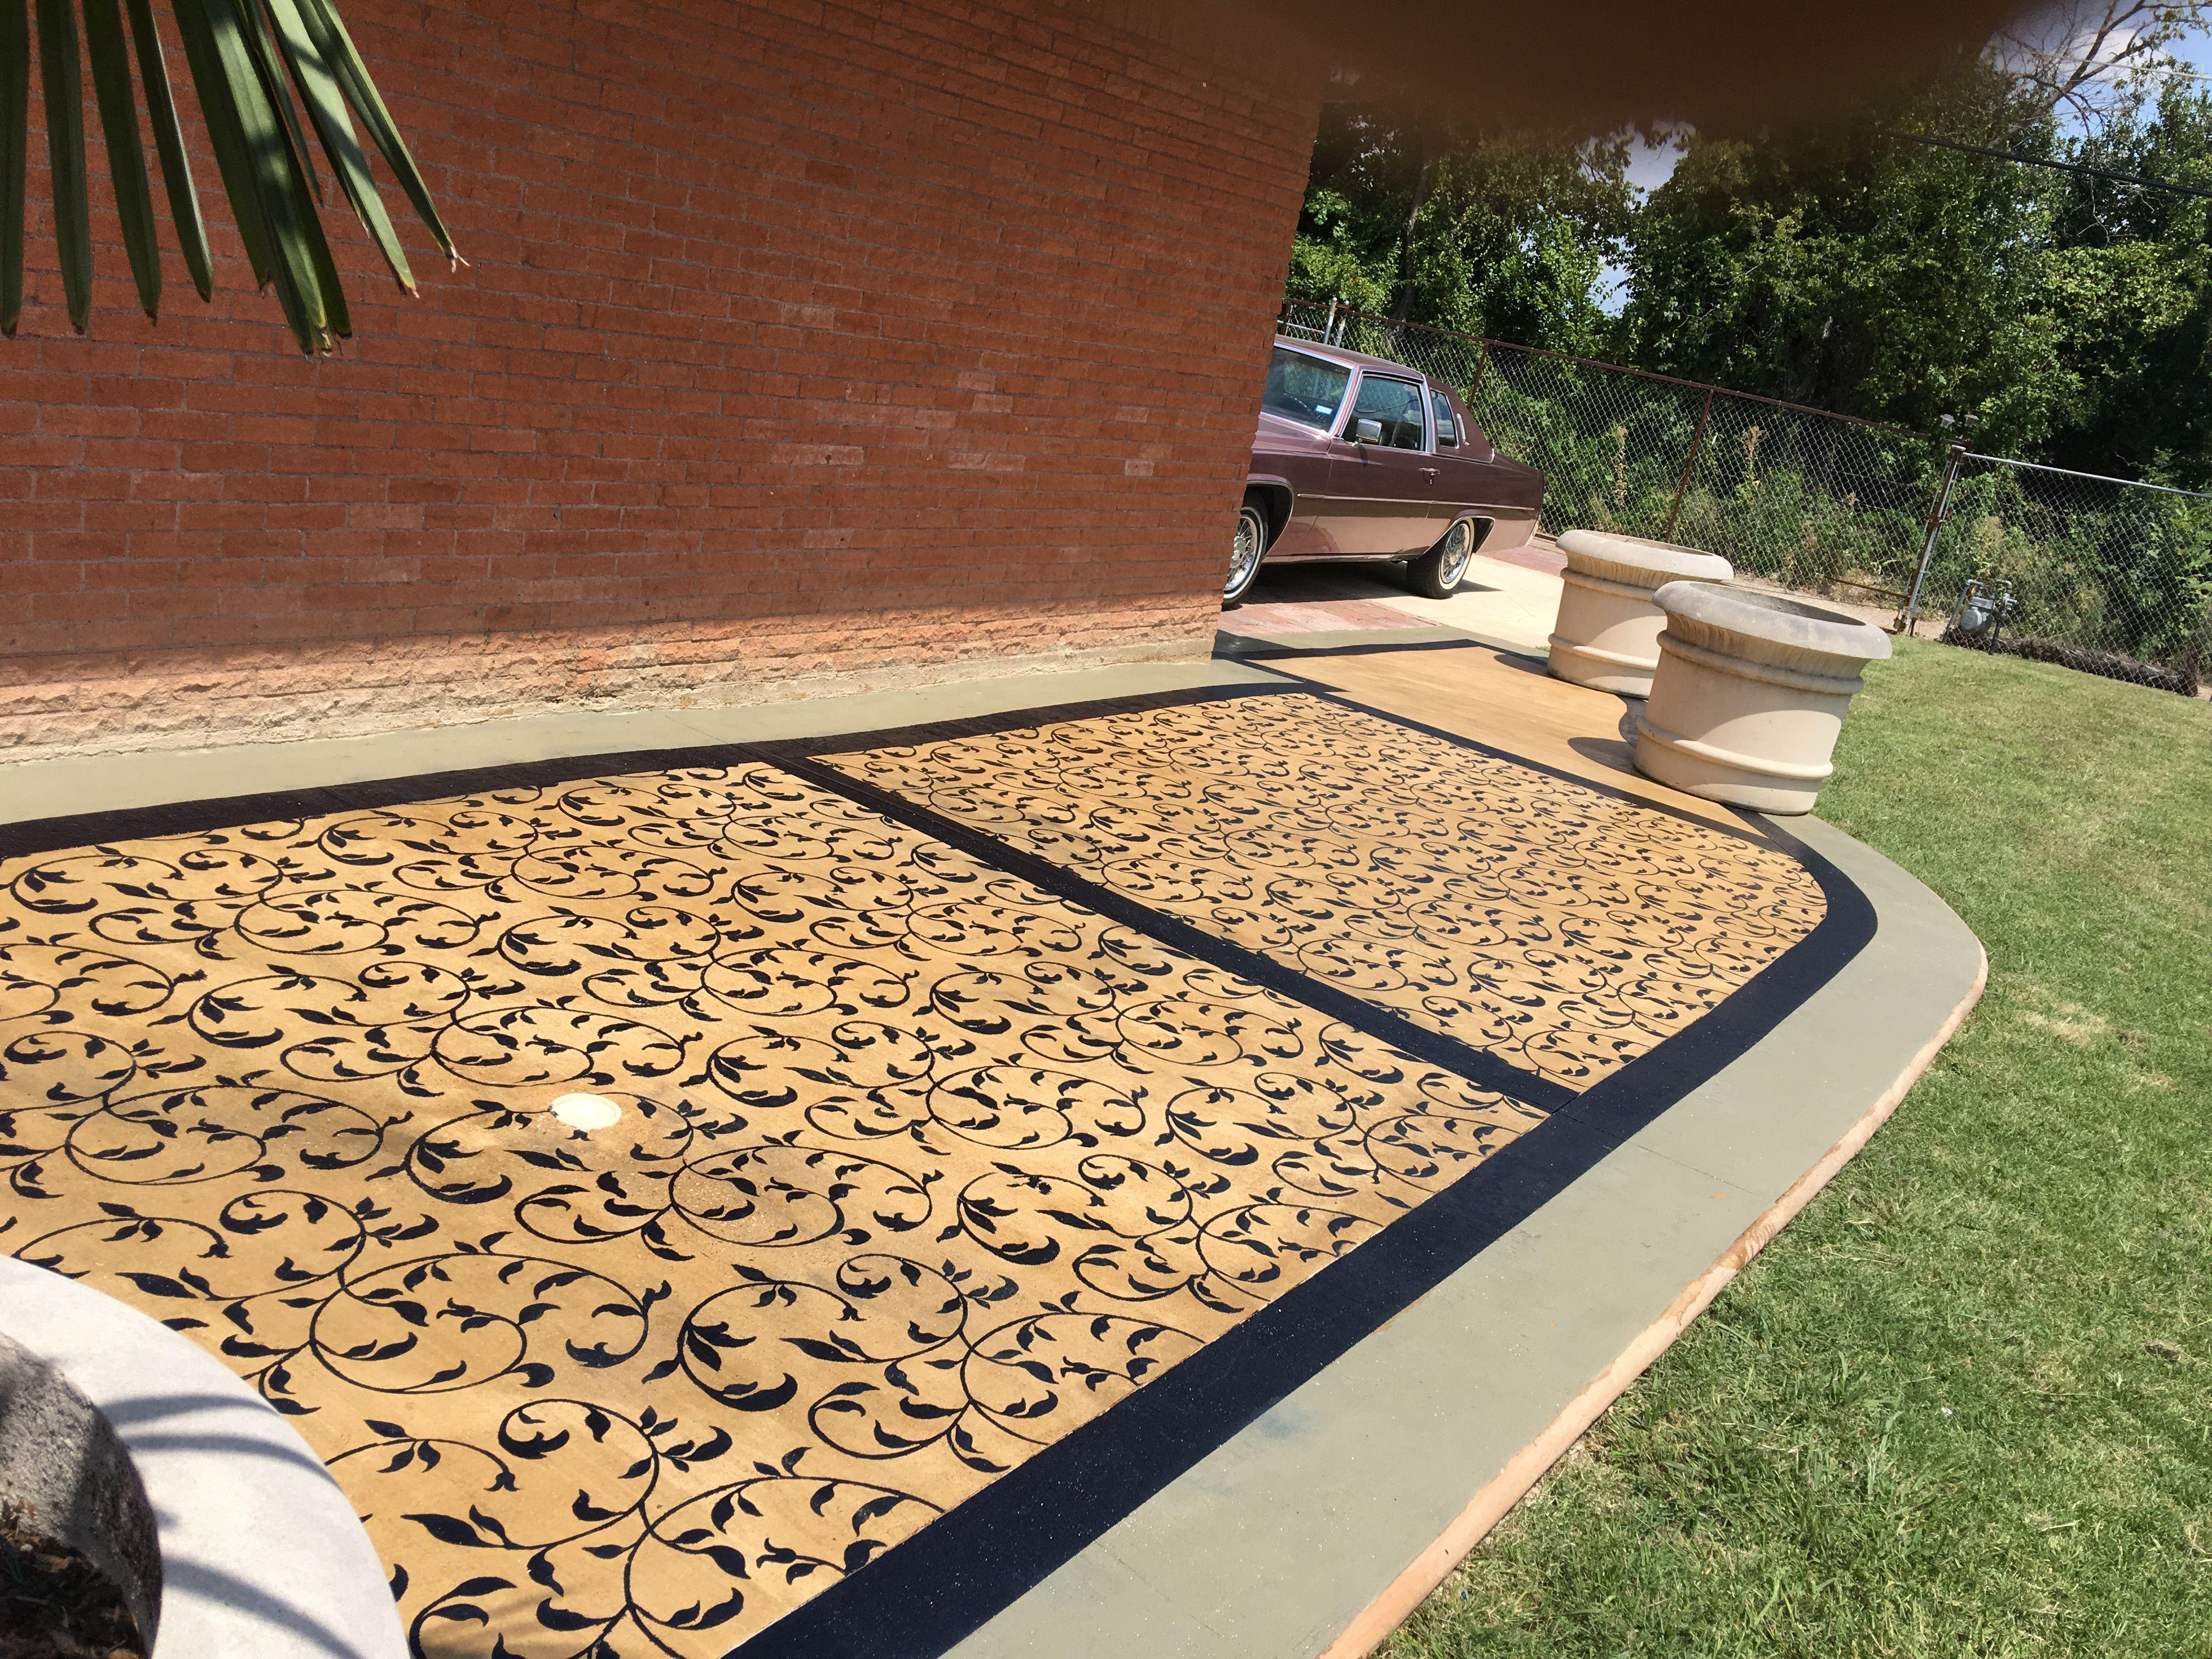 Outdoor patio porch floor concrete pattern decorative Modello